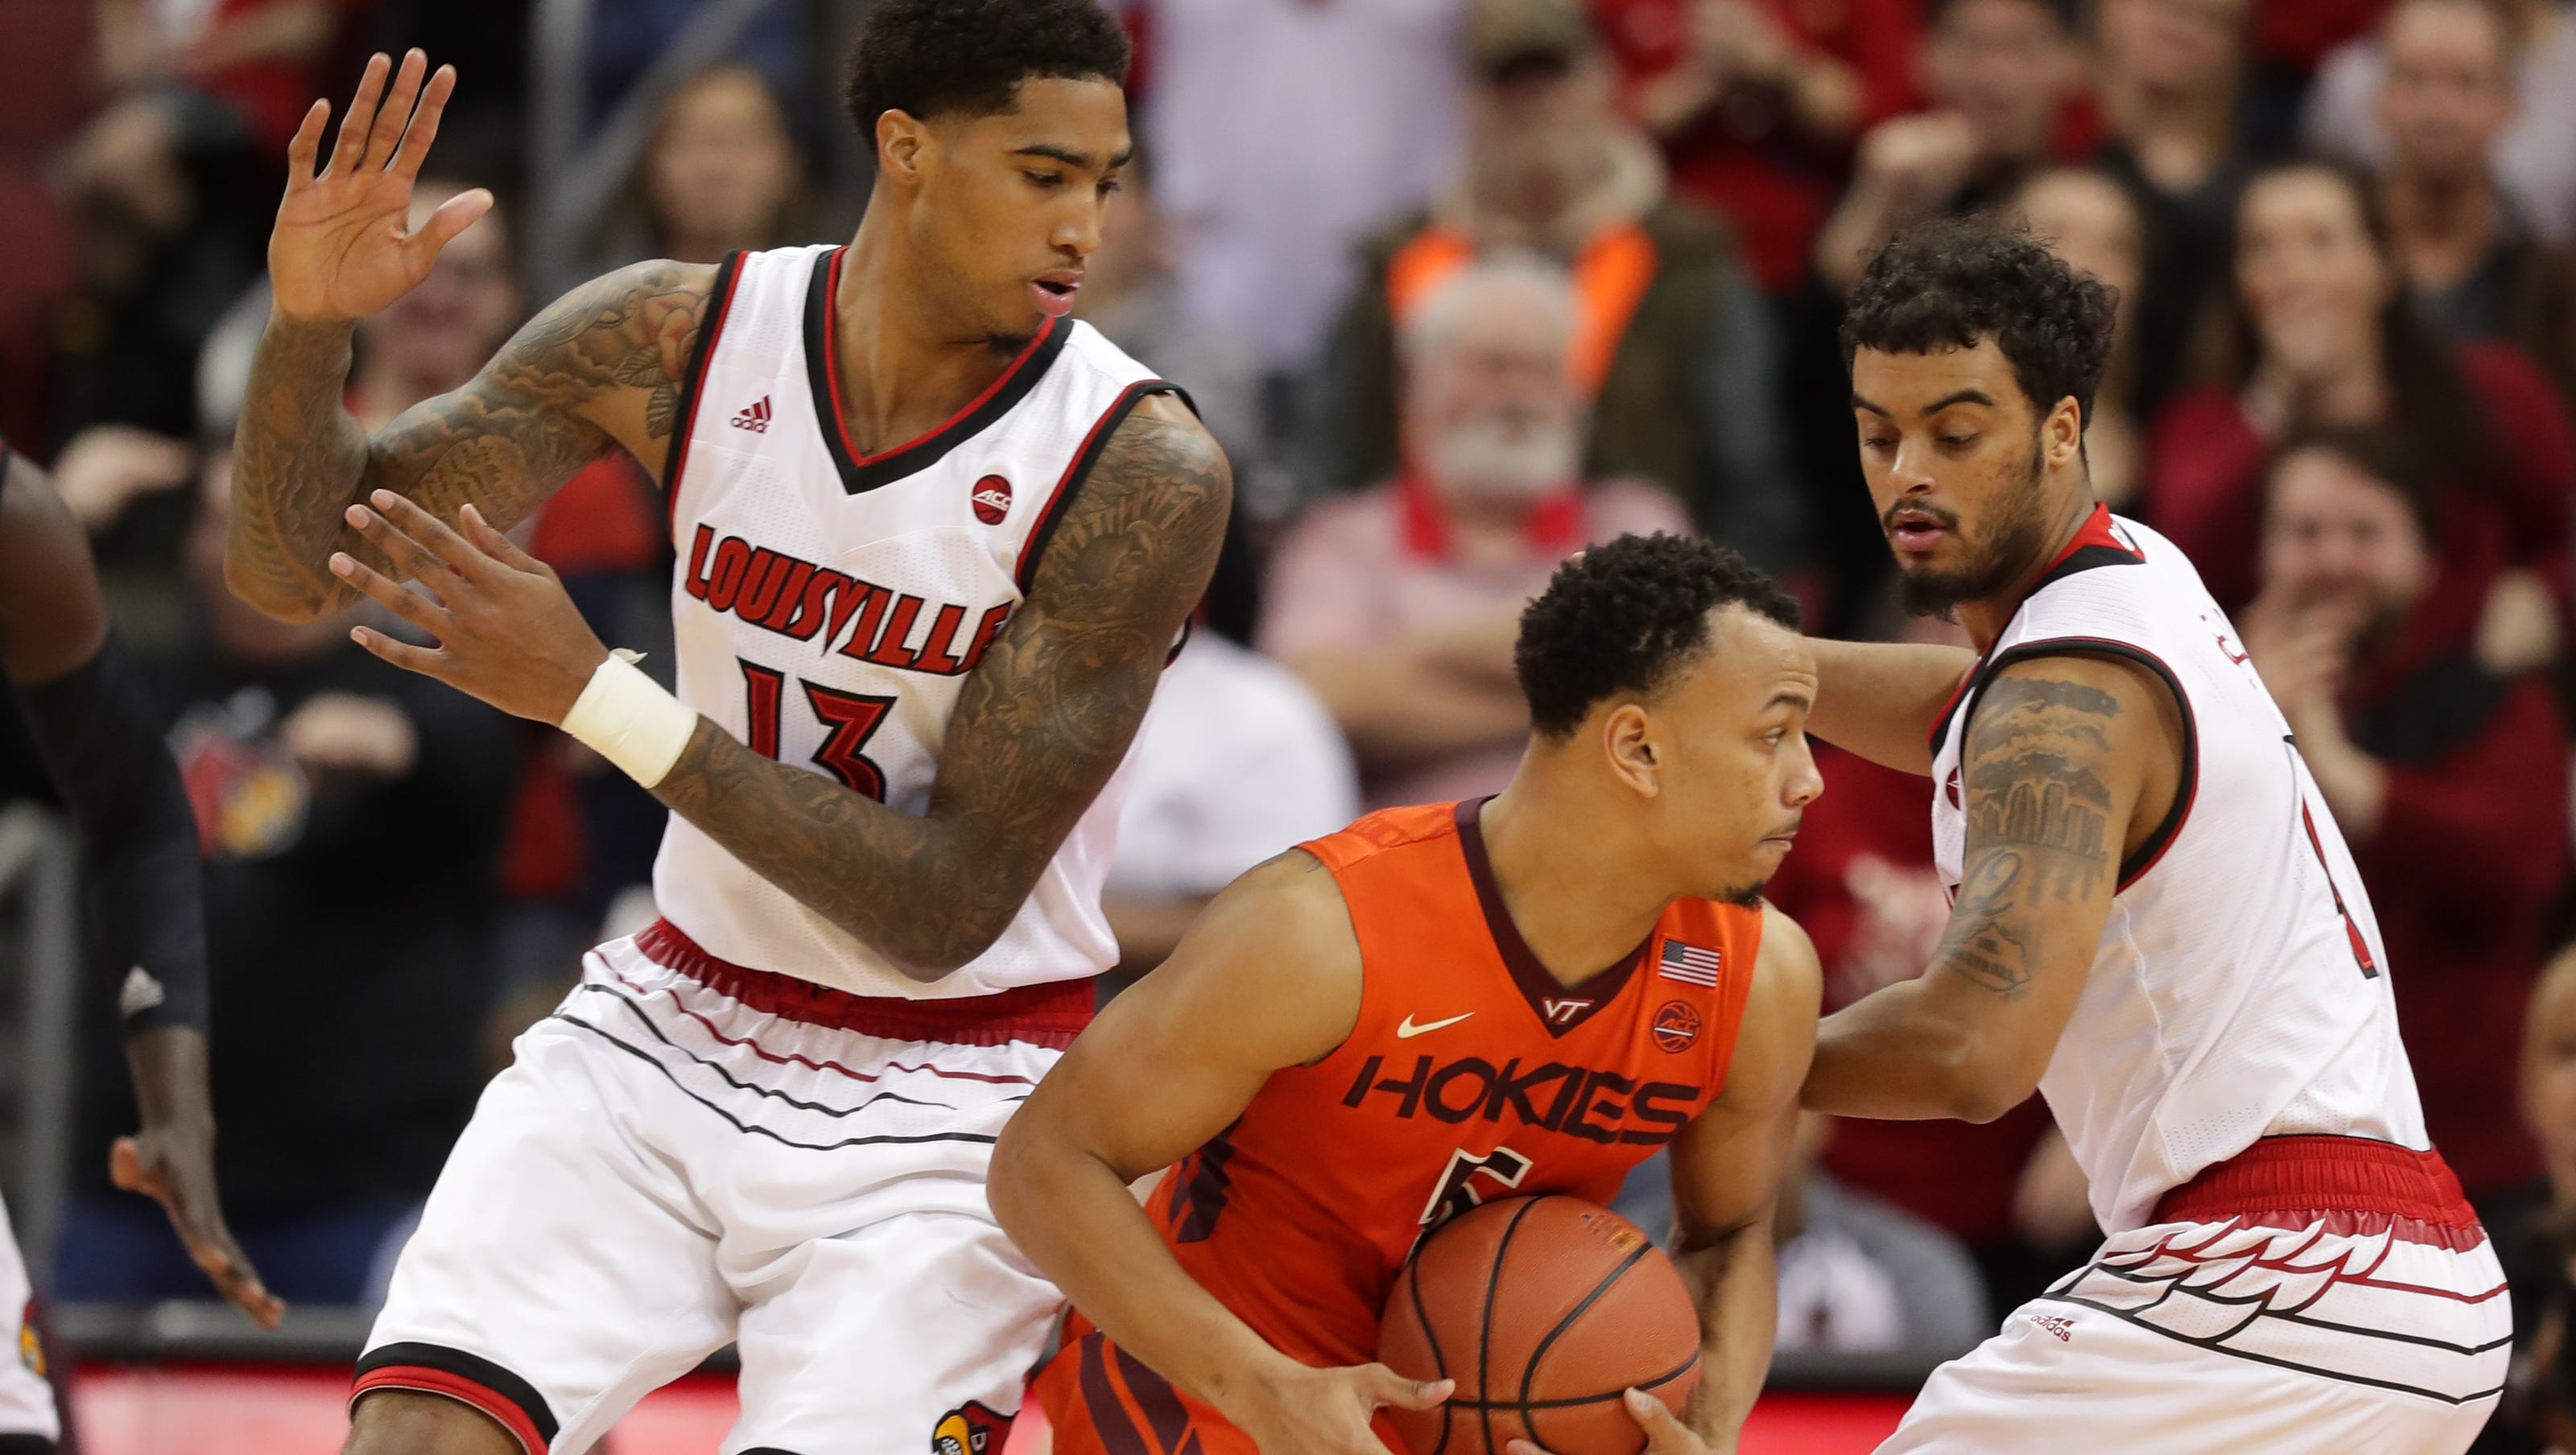 Louisville Basketball Vs Notre Dame How To Watch Listen Stream